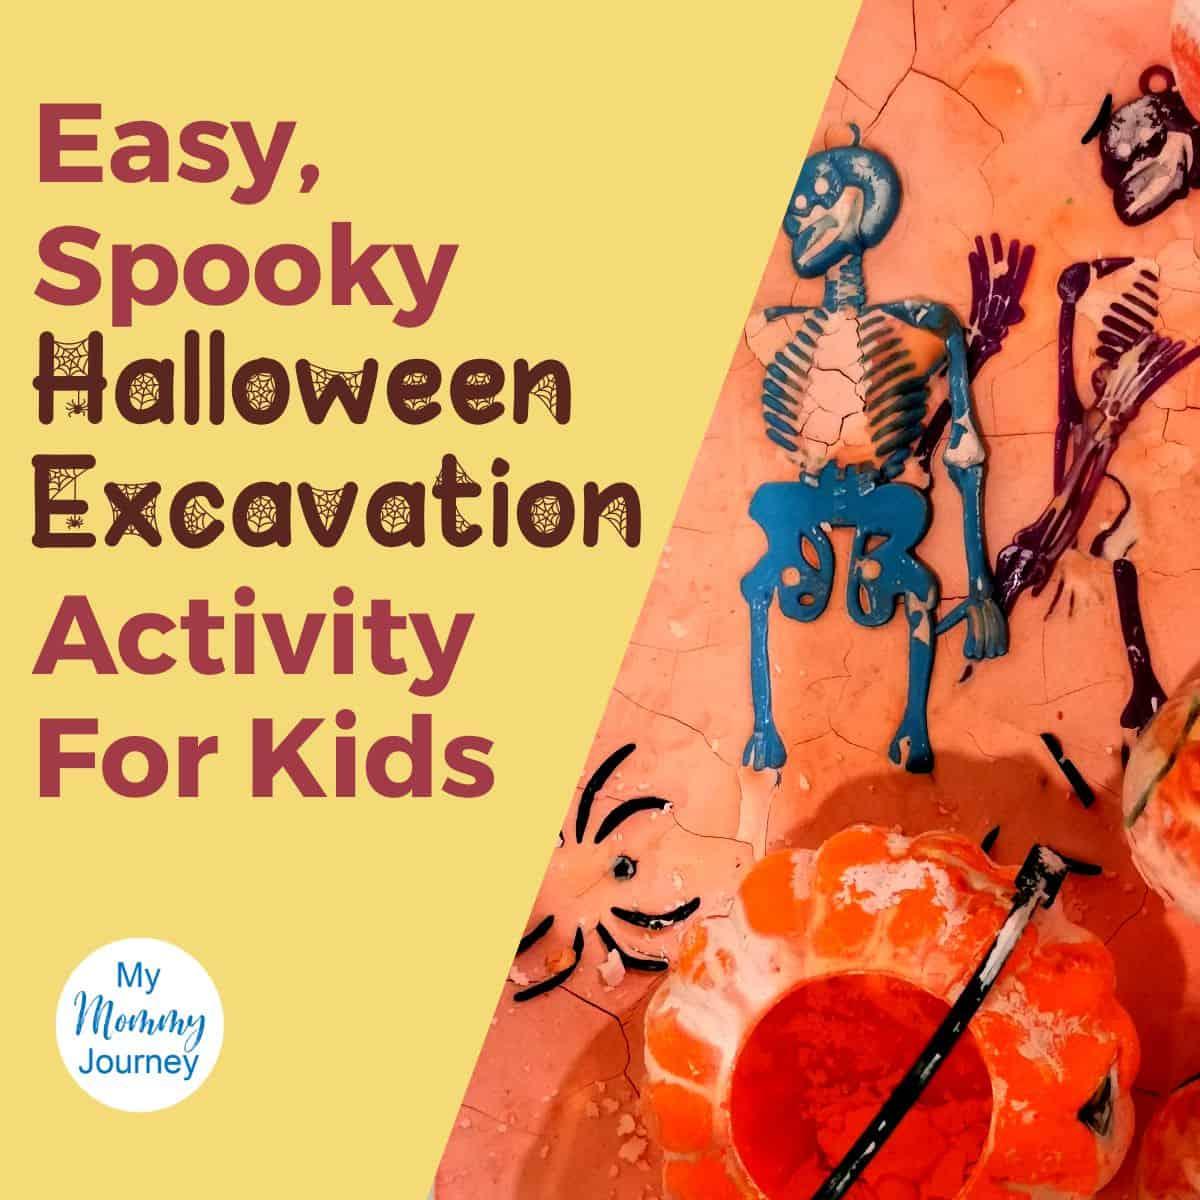 Easy Spooky Halloween Excavation Activity for Kids